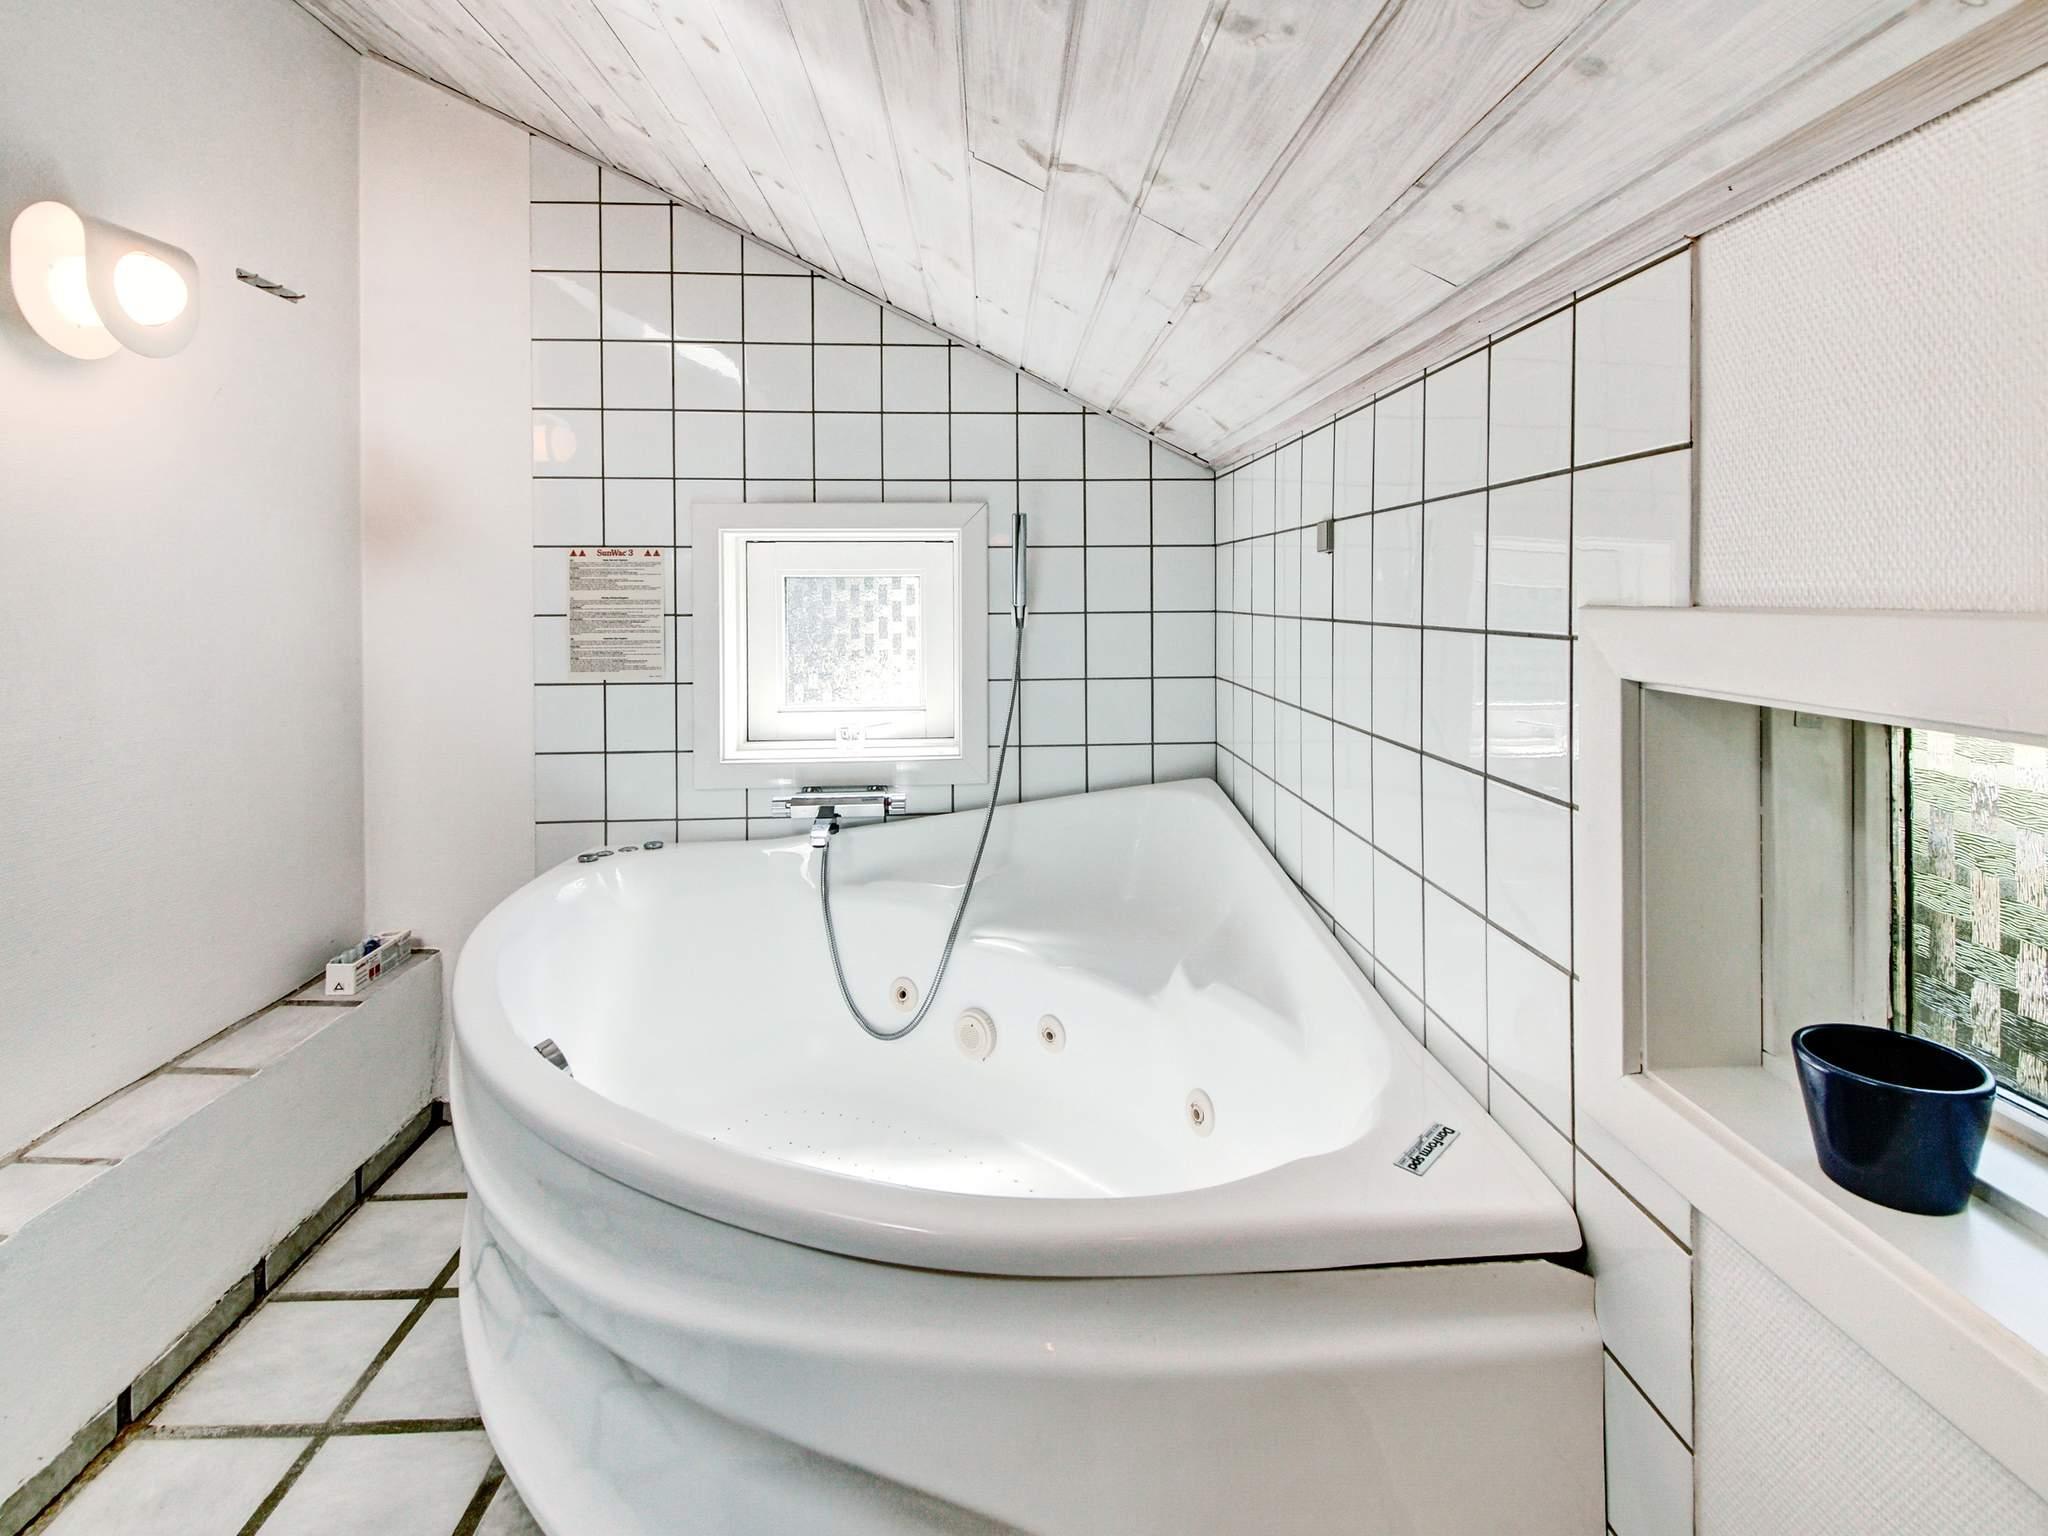 Ferienhaus Sommerodde (82544), Nexø, , Bornholm, Dänemark, Bild 11